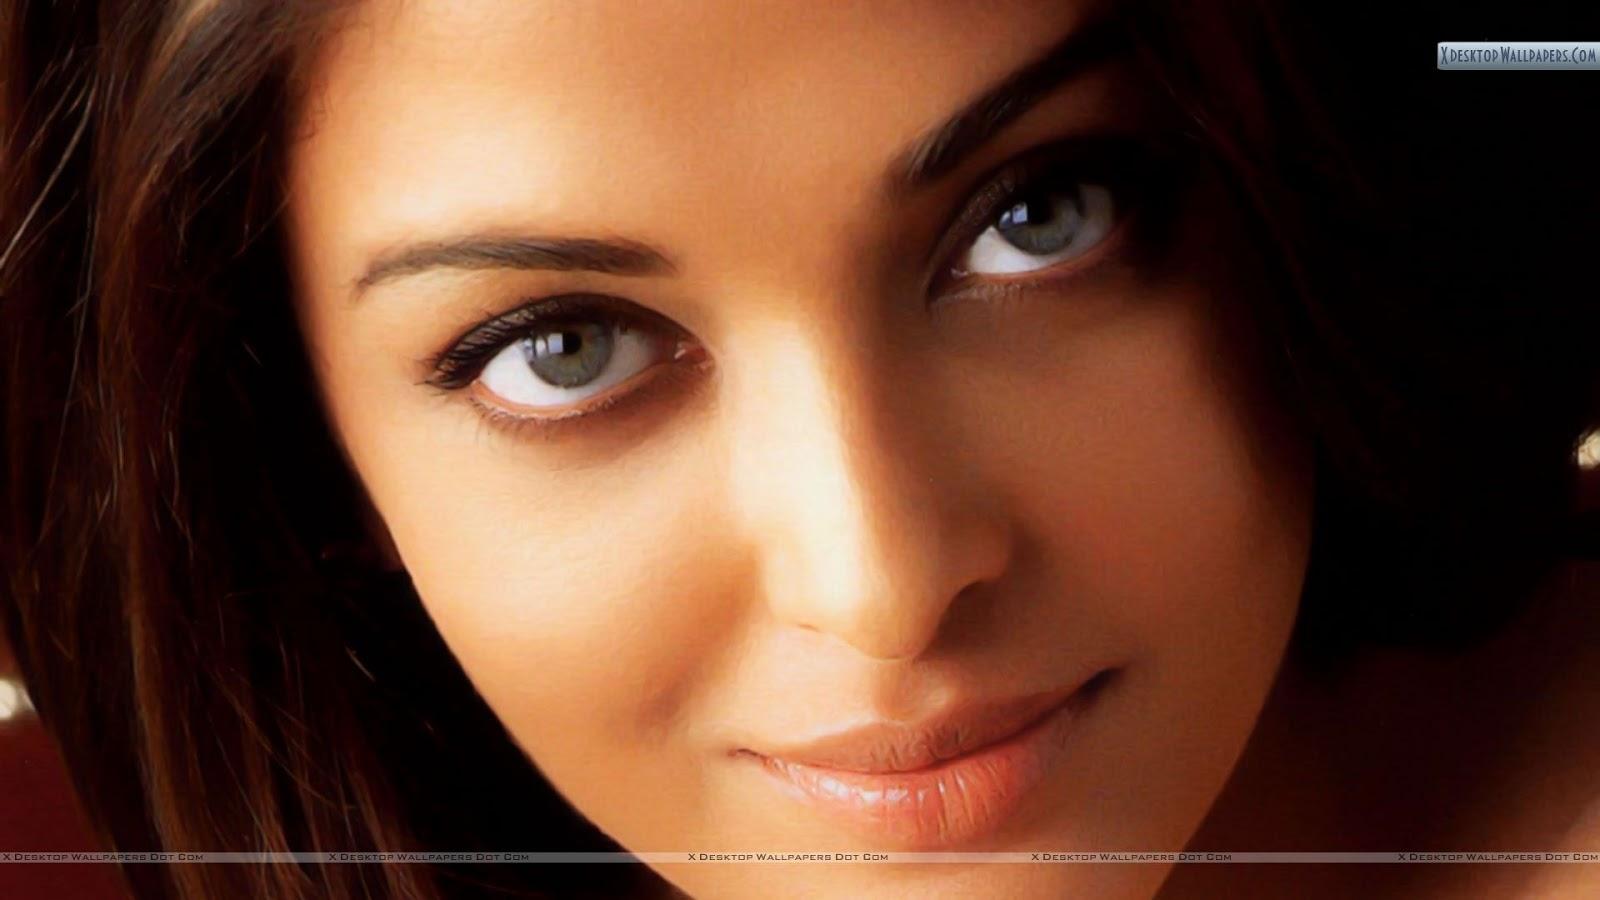 http://4.bp.blogspot.com/-Pa3qZTD73Nc/UPWppNAgtxI/AAAAAAAAAew/QfkkQeRH2dY/s1600/Aishwarya-Rai-Face-Closeup-And-Smiling.jpg